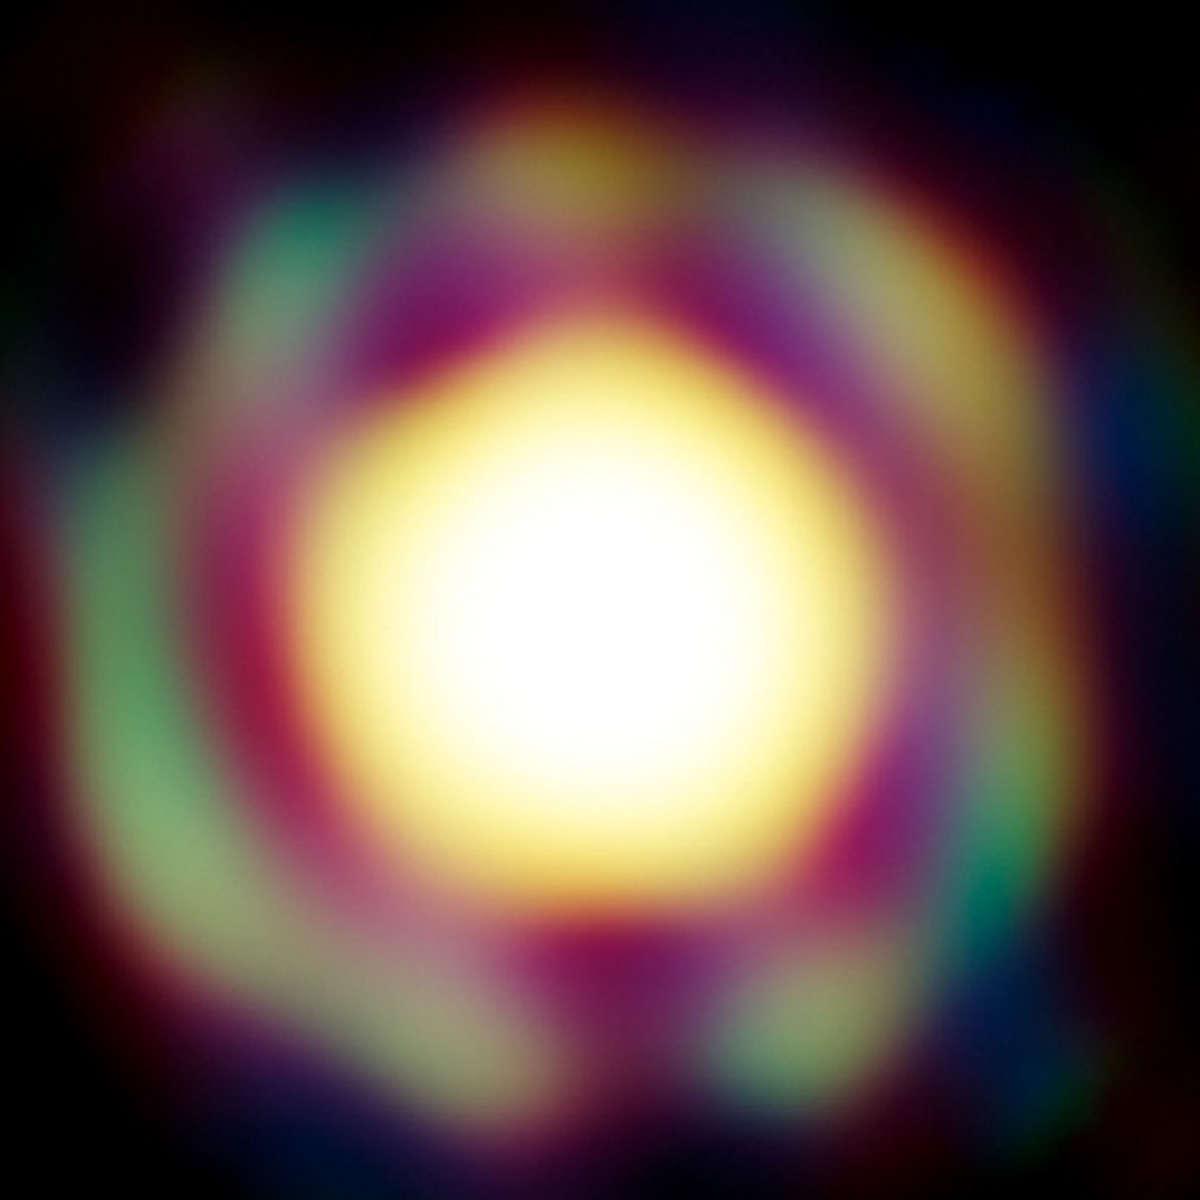 eso_The red supergiant star T Leporis, imaged using the VLTI array. Credit: ESO/J.-B. Le Bouquin et al.tleporis_hero